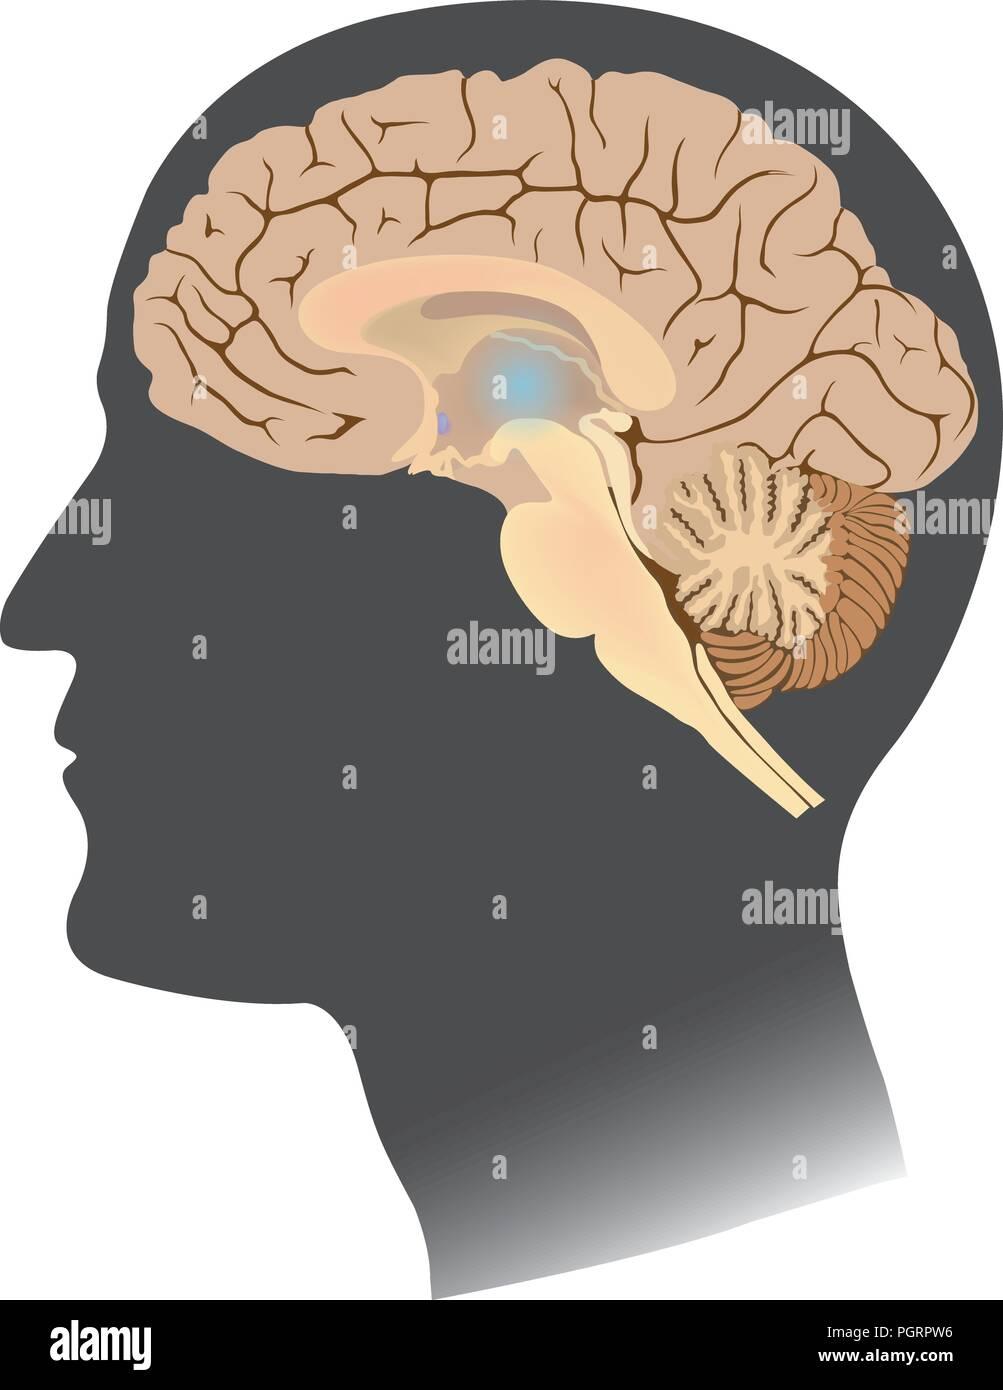 Human Brain white isolate. Anatomy body infographic. Illustration. - Stock Image